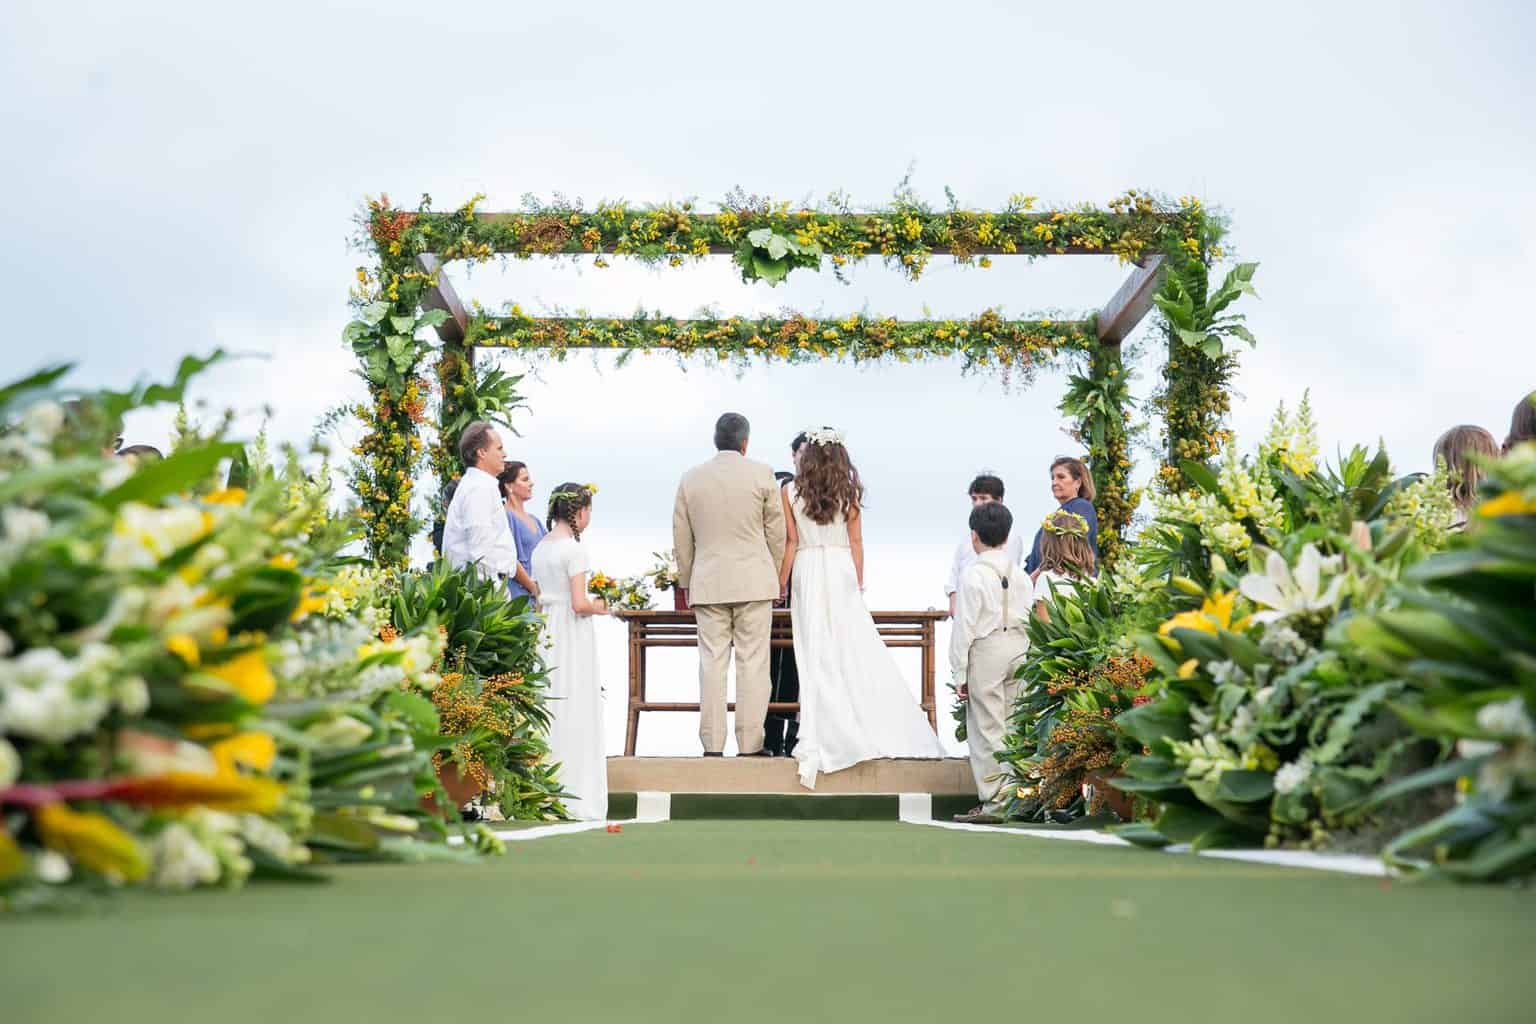 casamento-real-anda-e-rodrigo-caseme-72